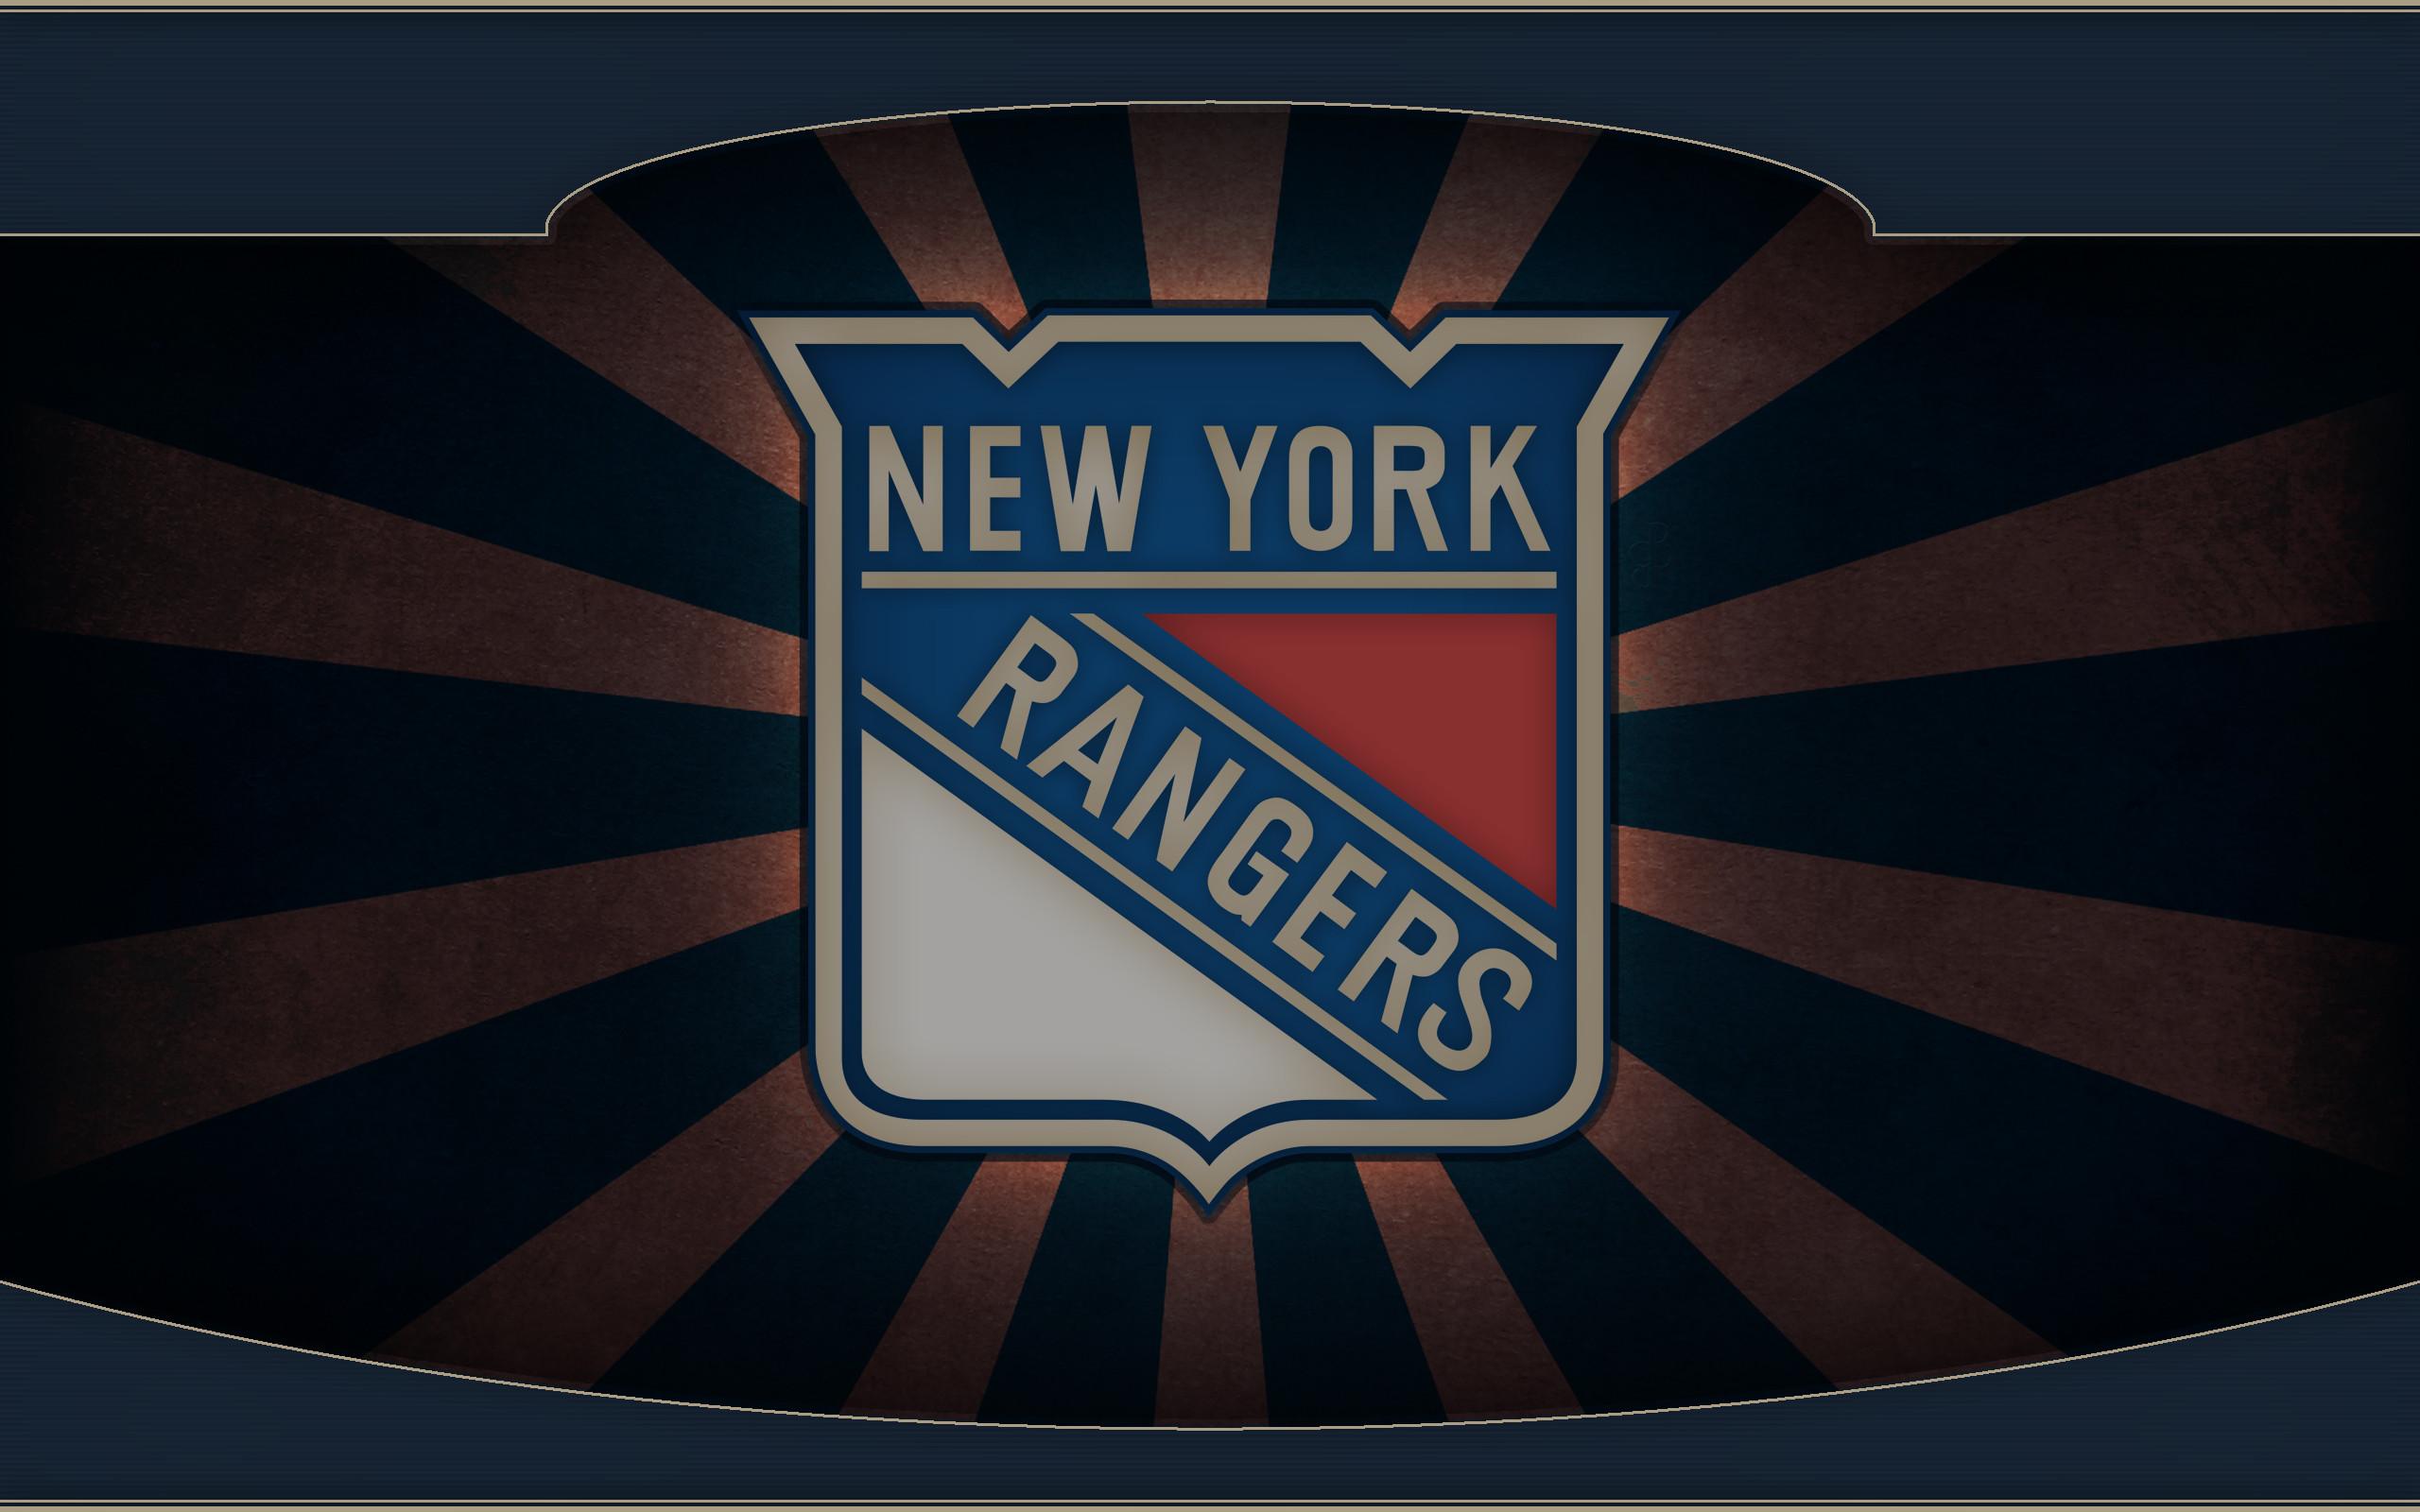 3000x1879 New York Rangers Wallpapers